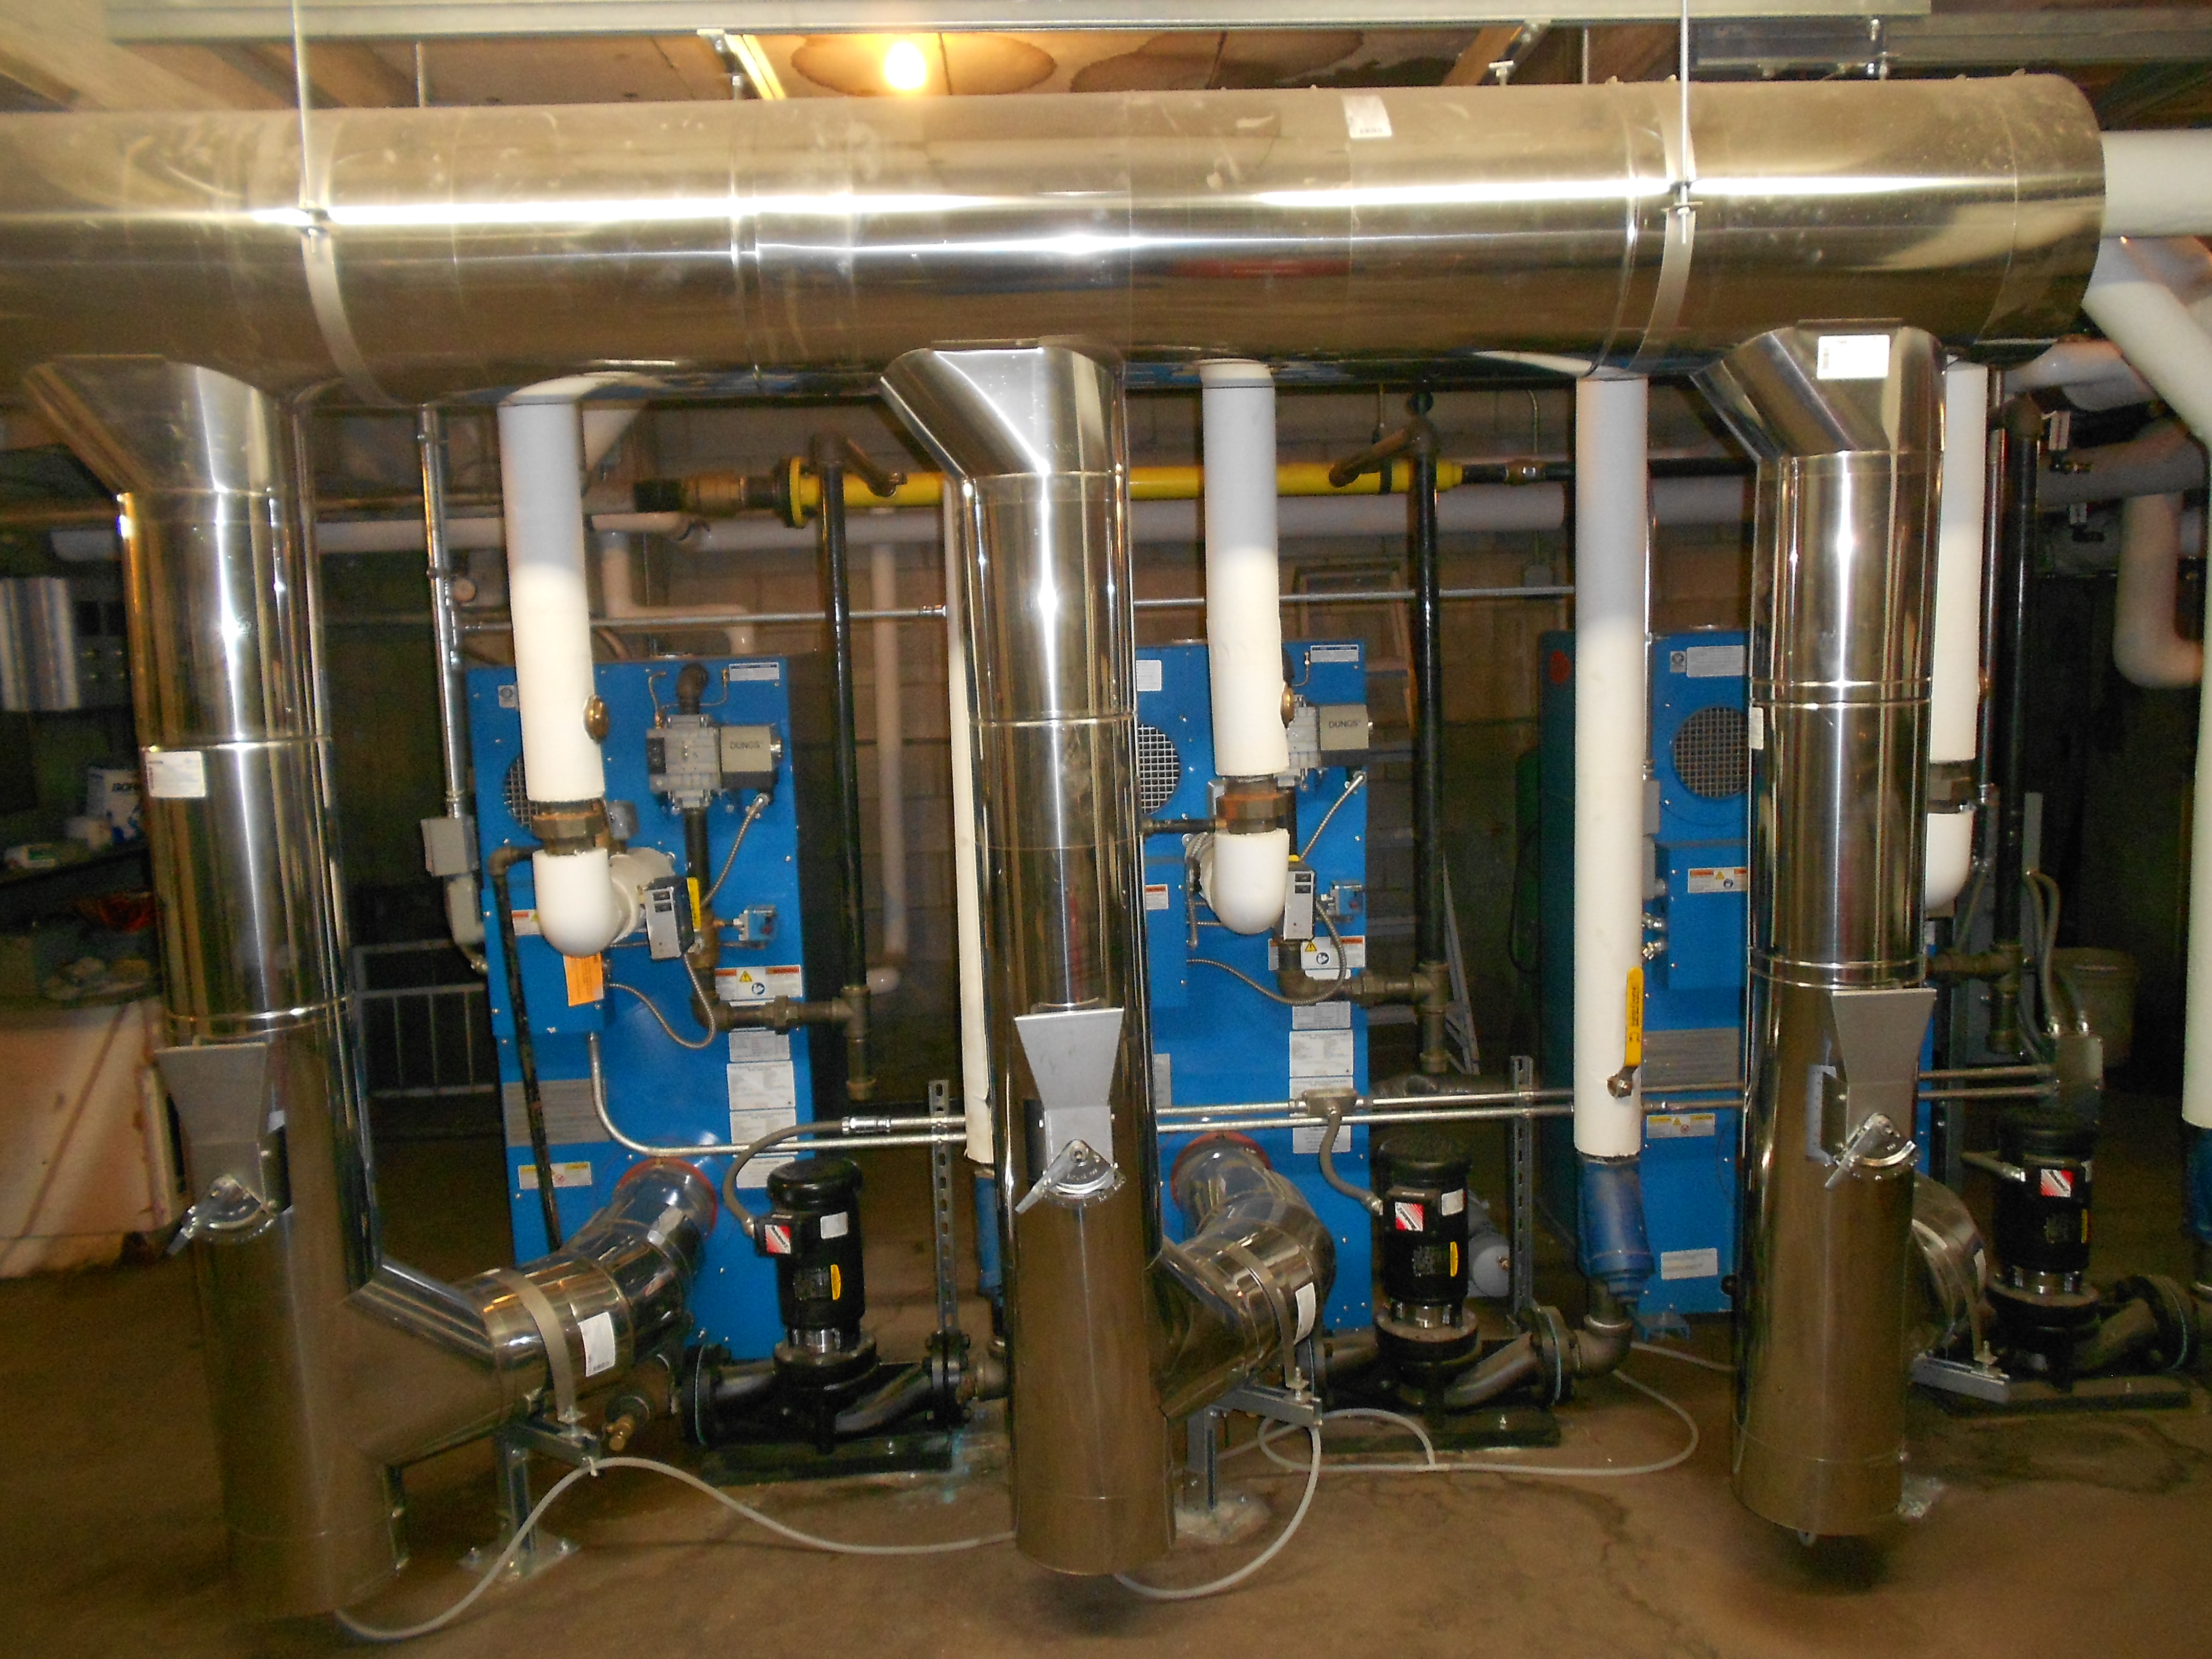 Upgrade of a 50-year old heating system at Santa Monica Condominium ...